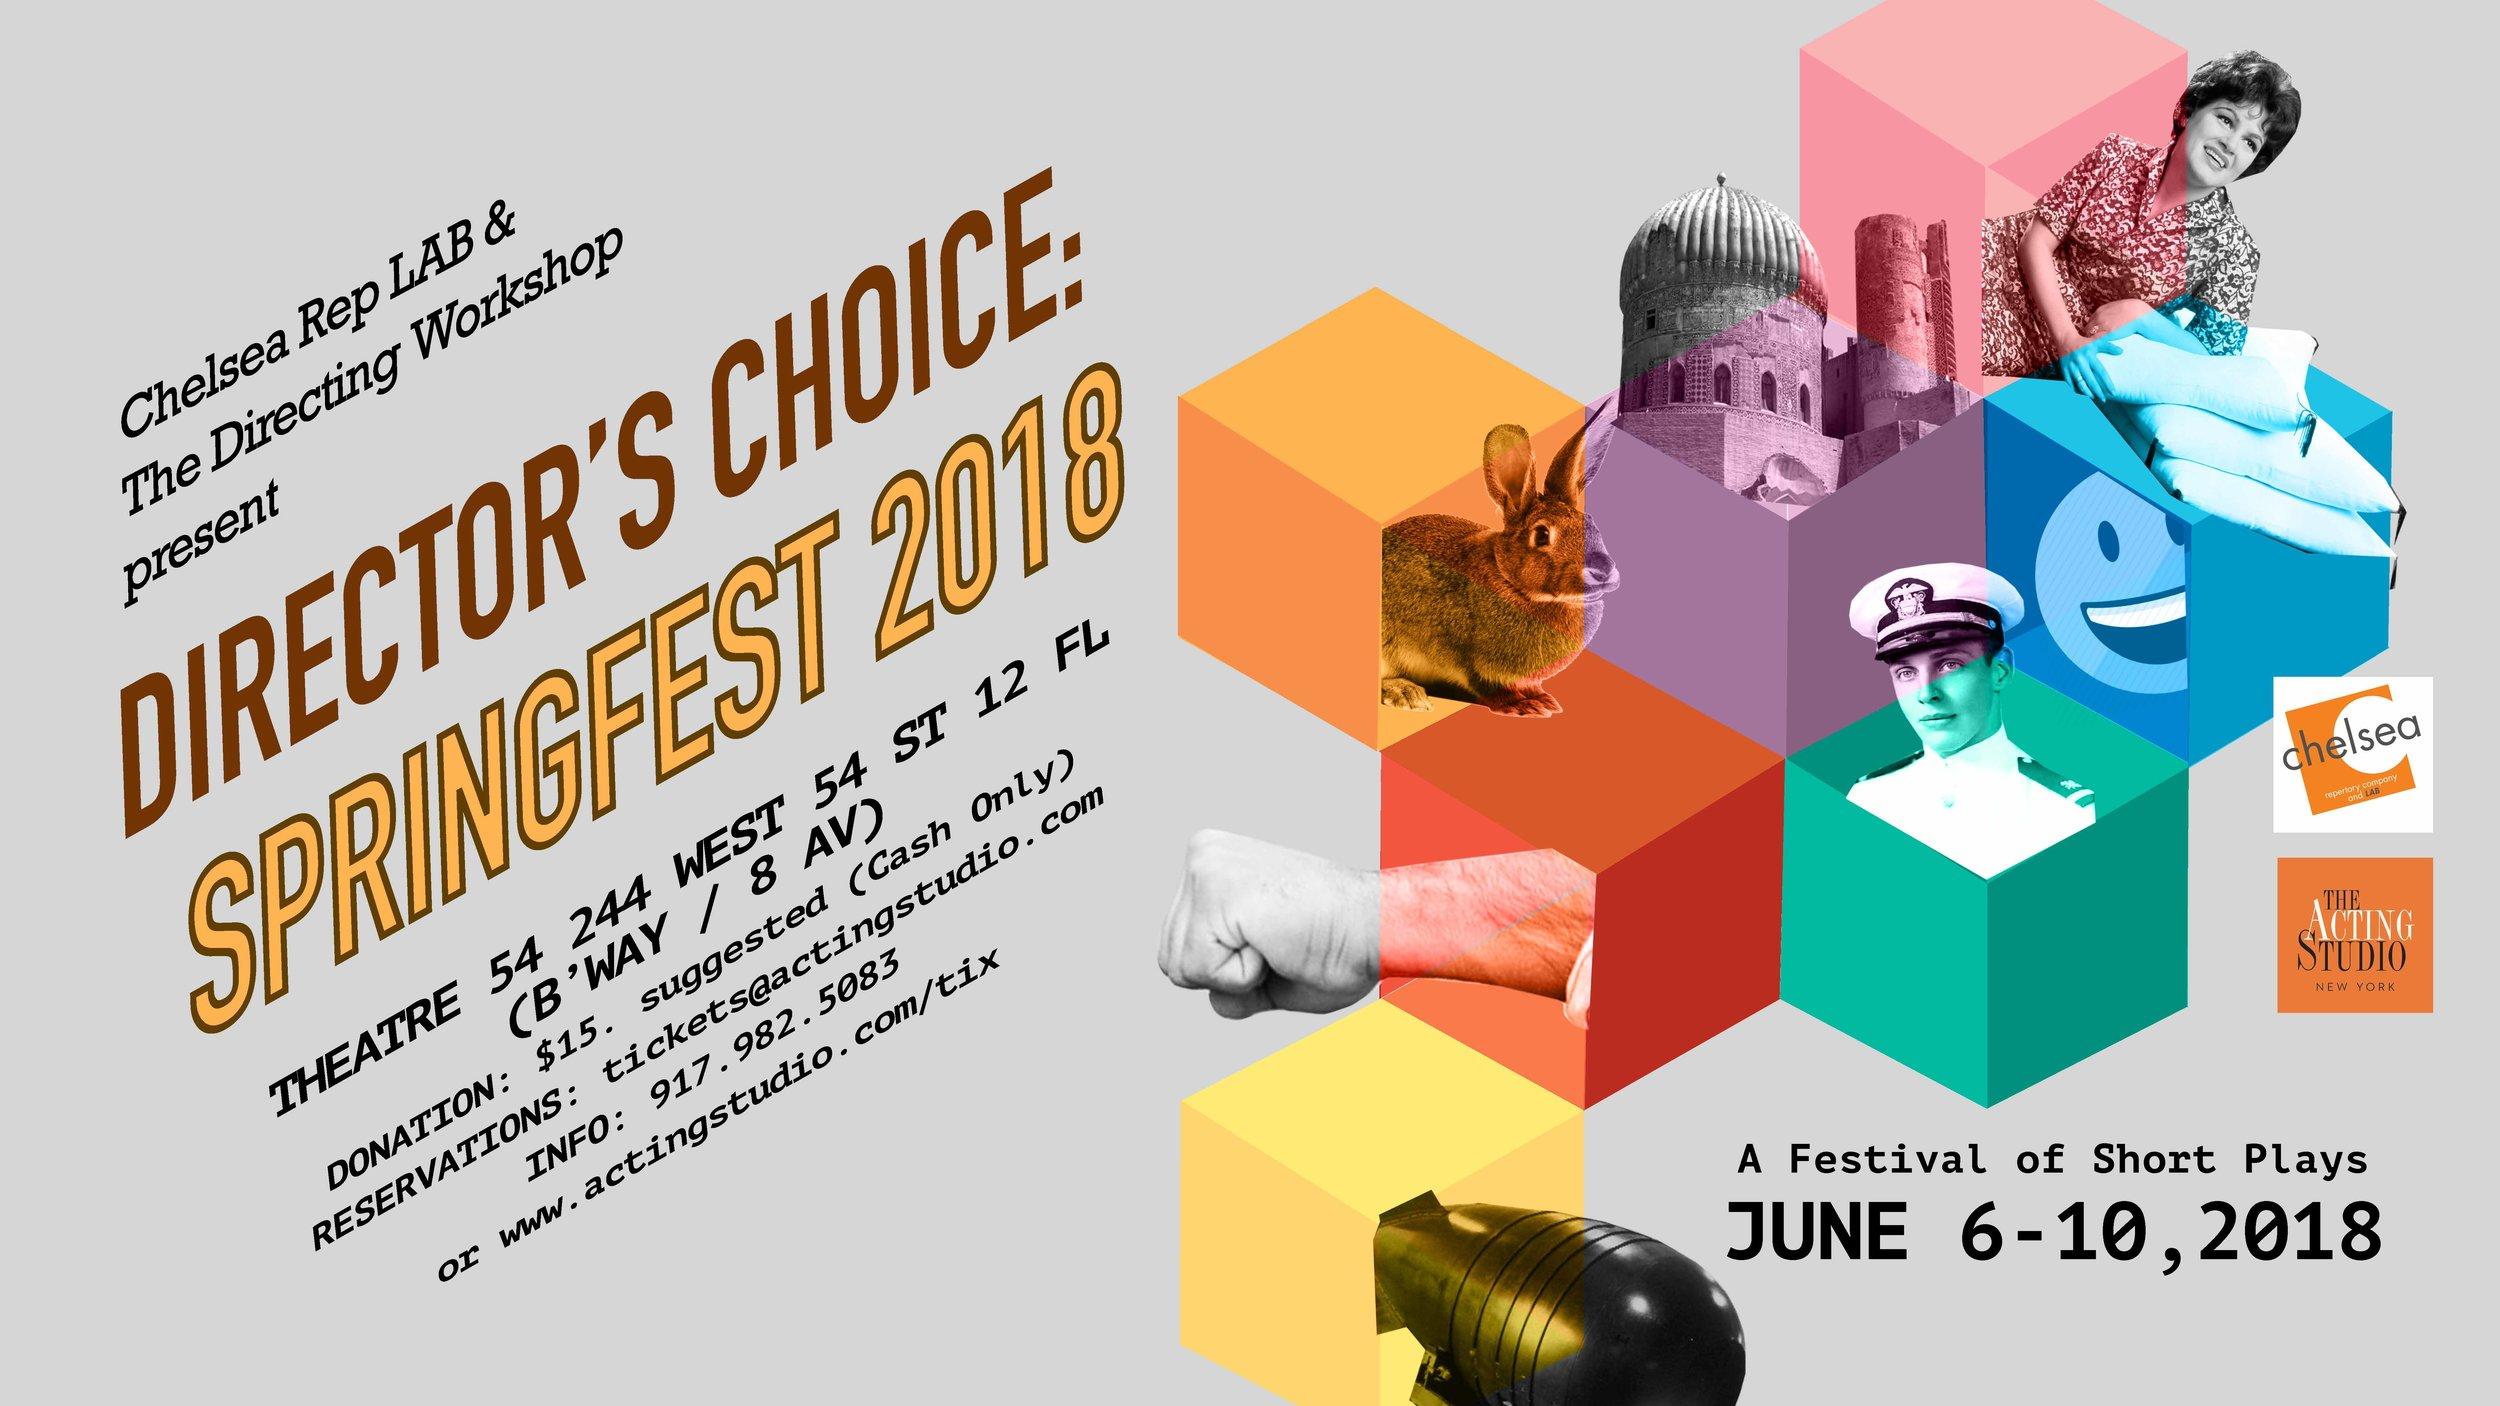 Springfest_fb_banner_2018_event.jpg